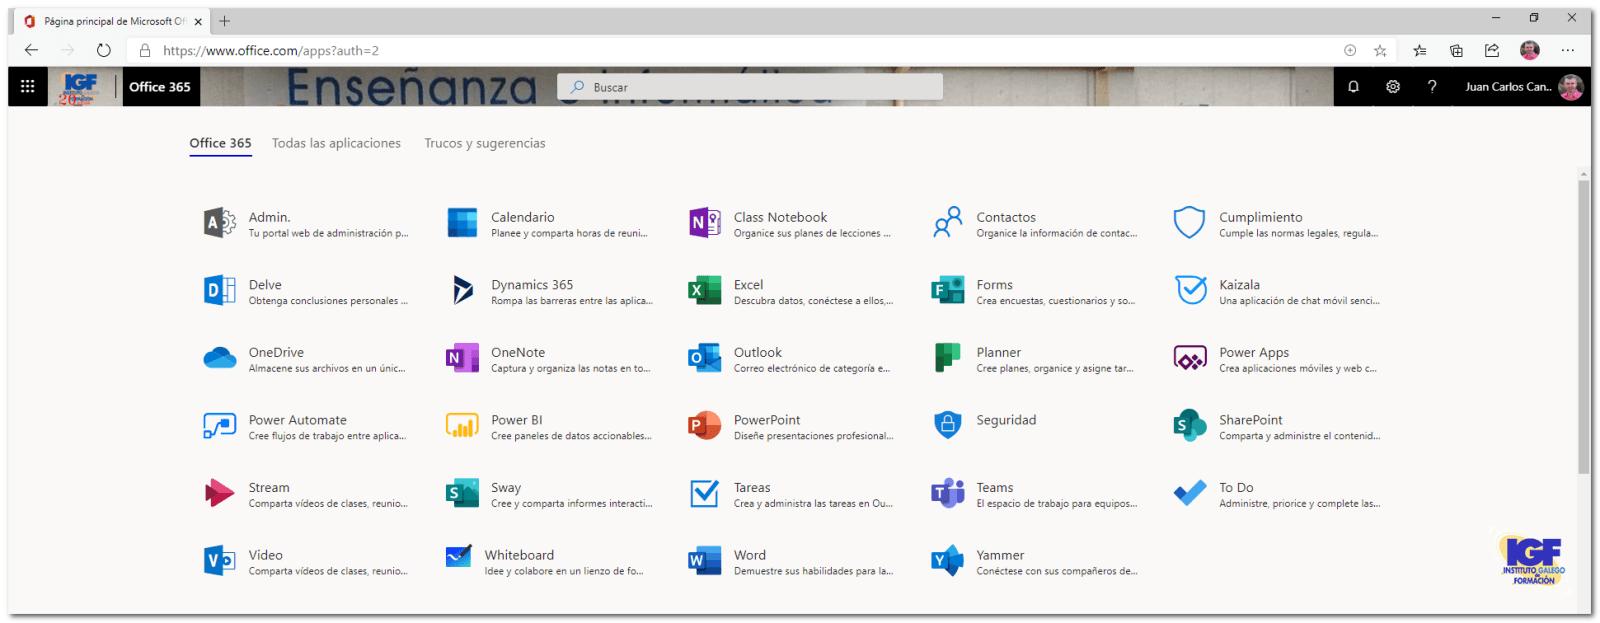 Microsoft 365 - igf.es